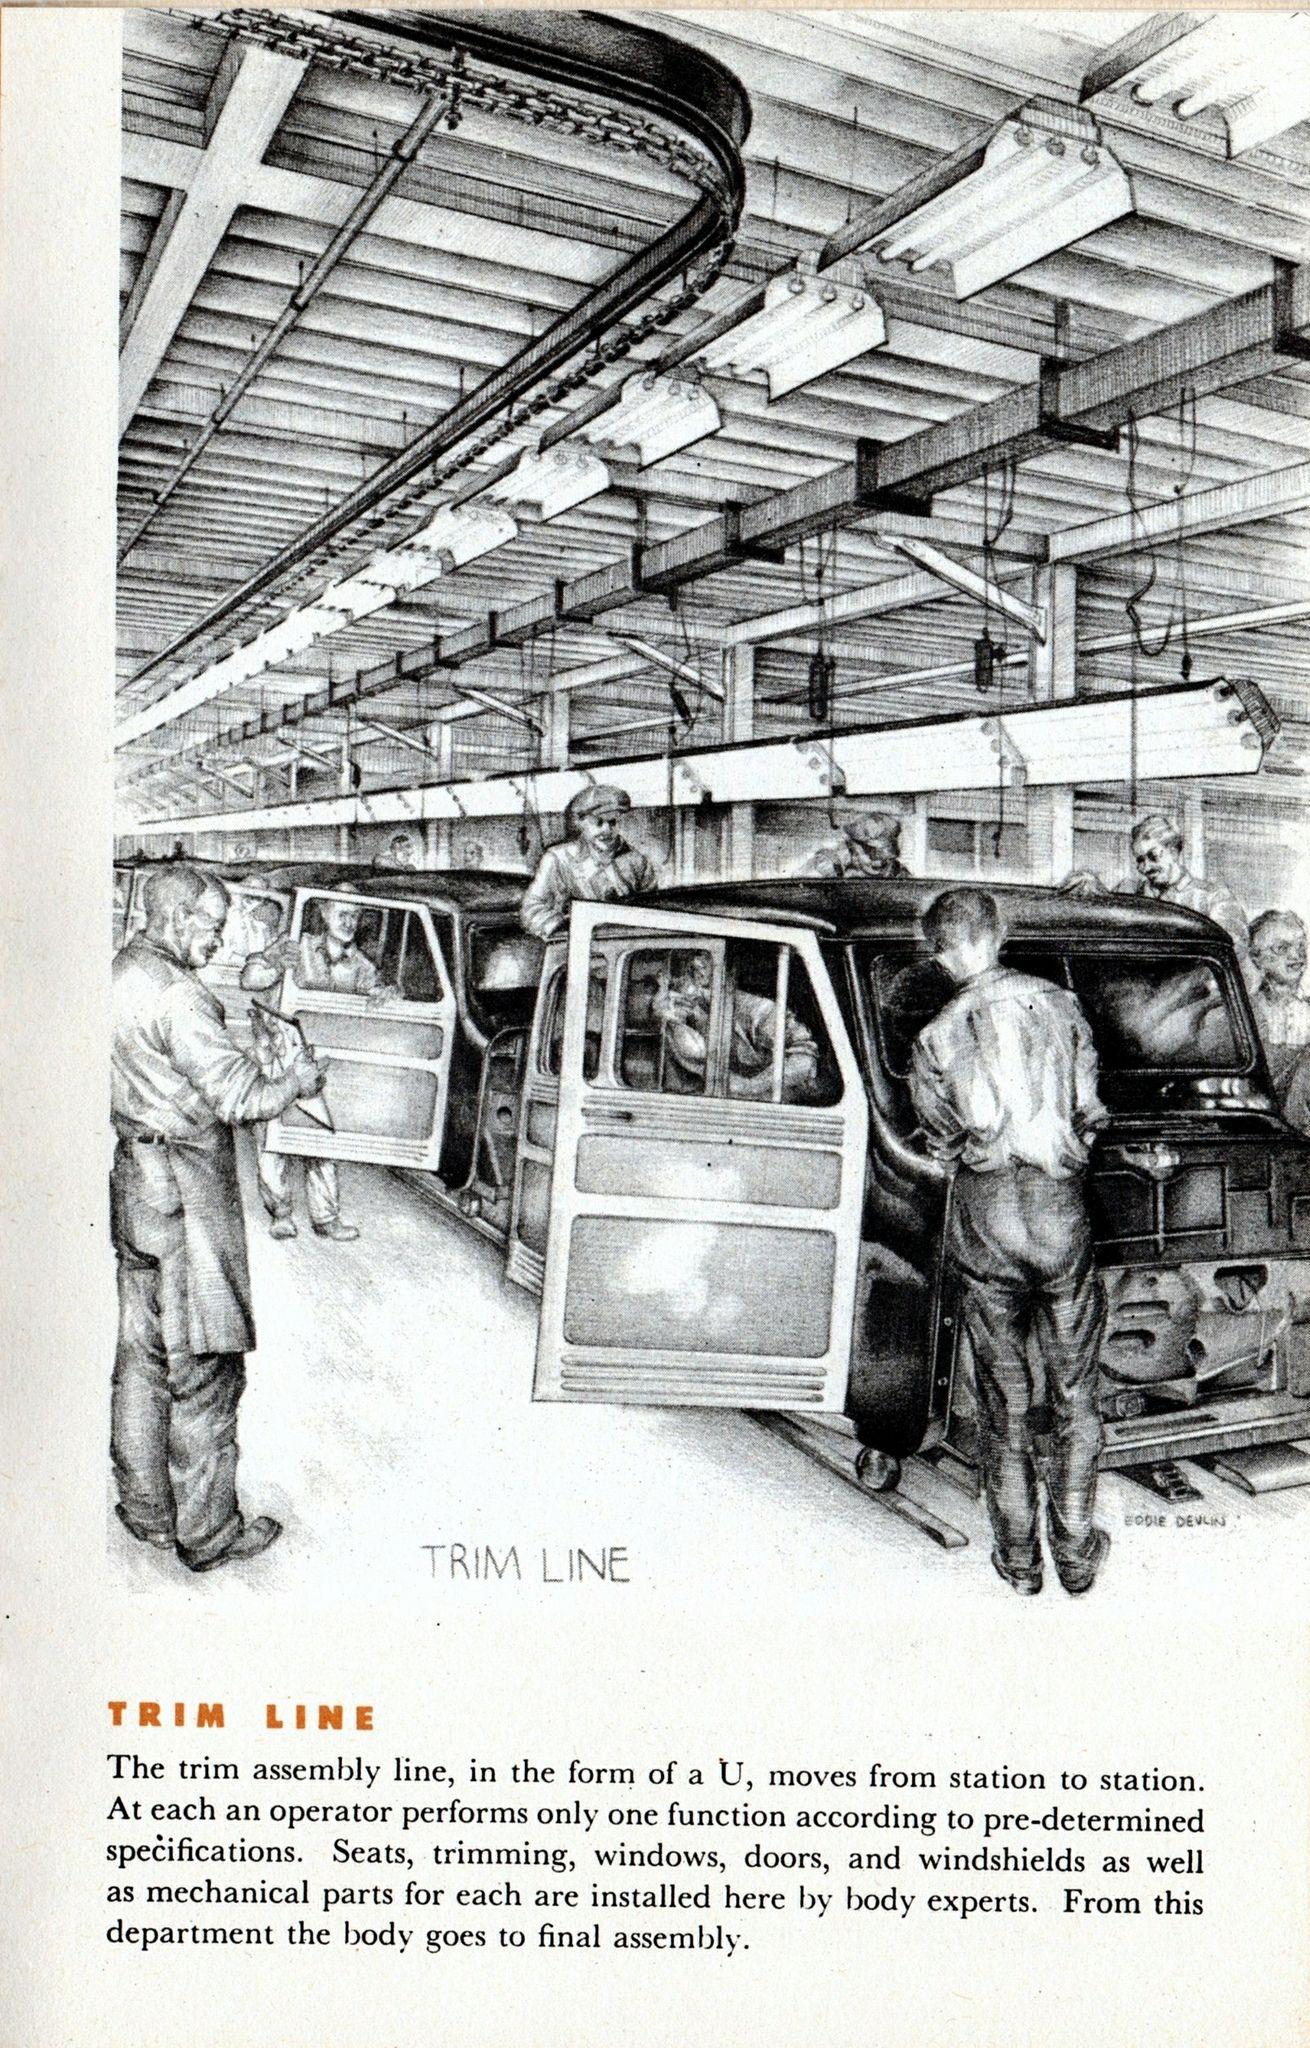 1948 Willys Jeep Station Wagon Assembly Line Trim Line Willys Wagon Jeep Station Wagon